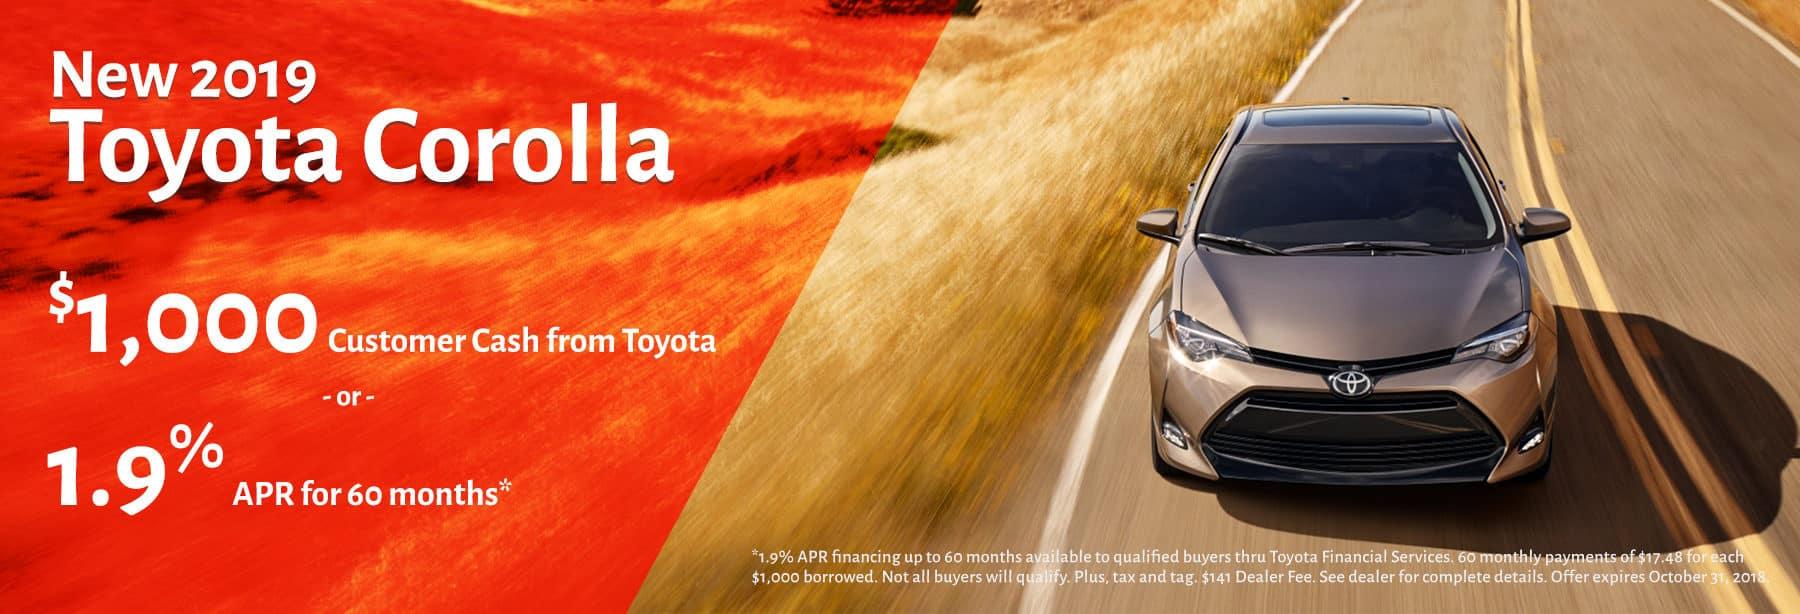 Toyota Corolla October 2018 Promotion